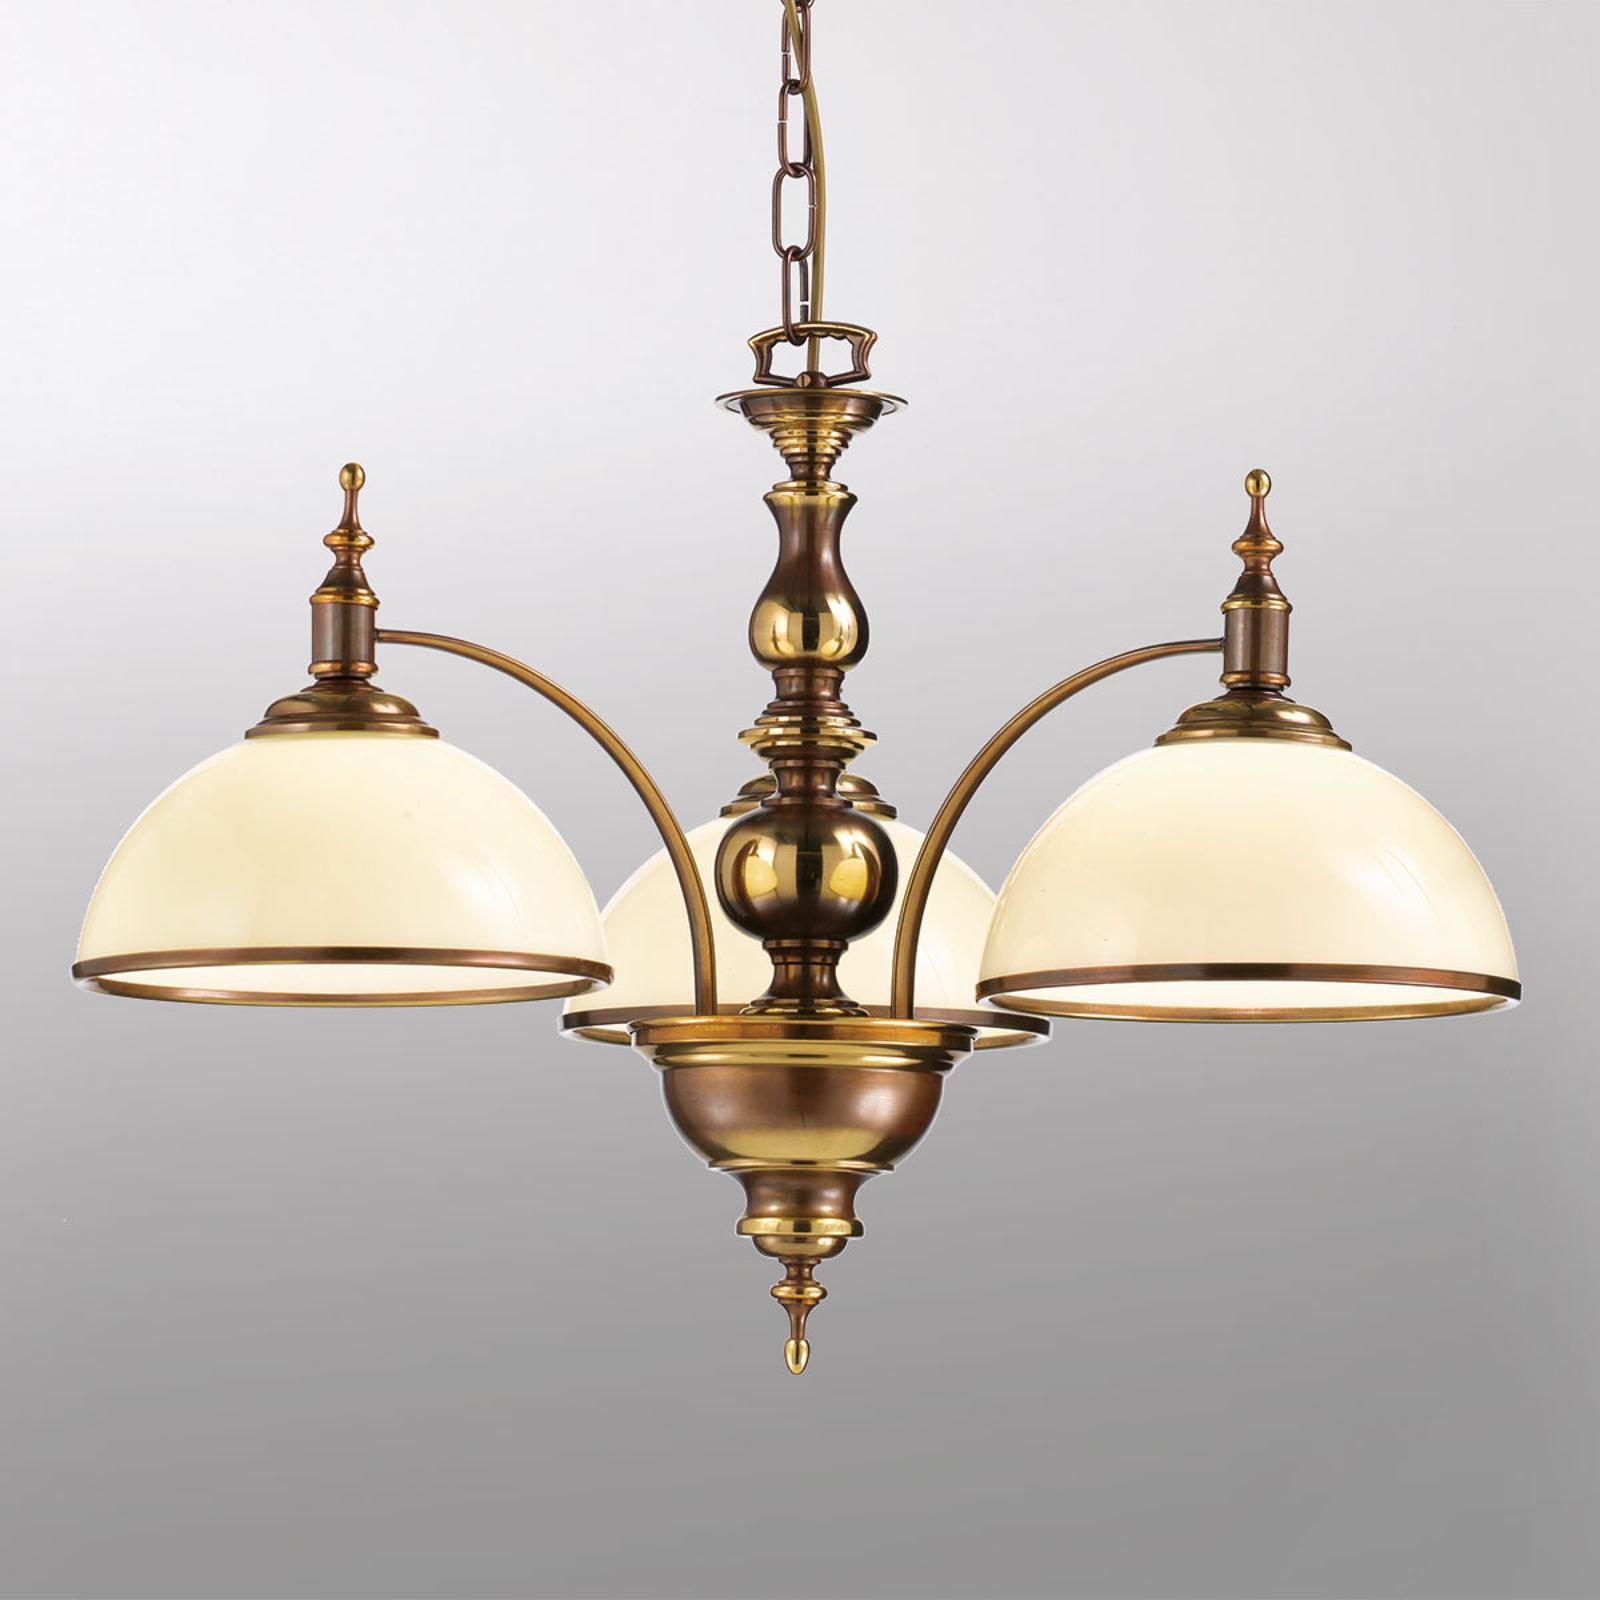 Antiek ogende hanglamp Corola, 3-lichts